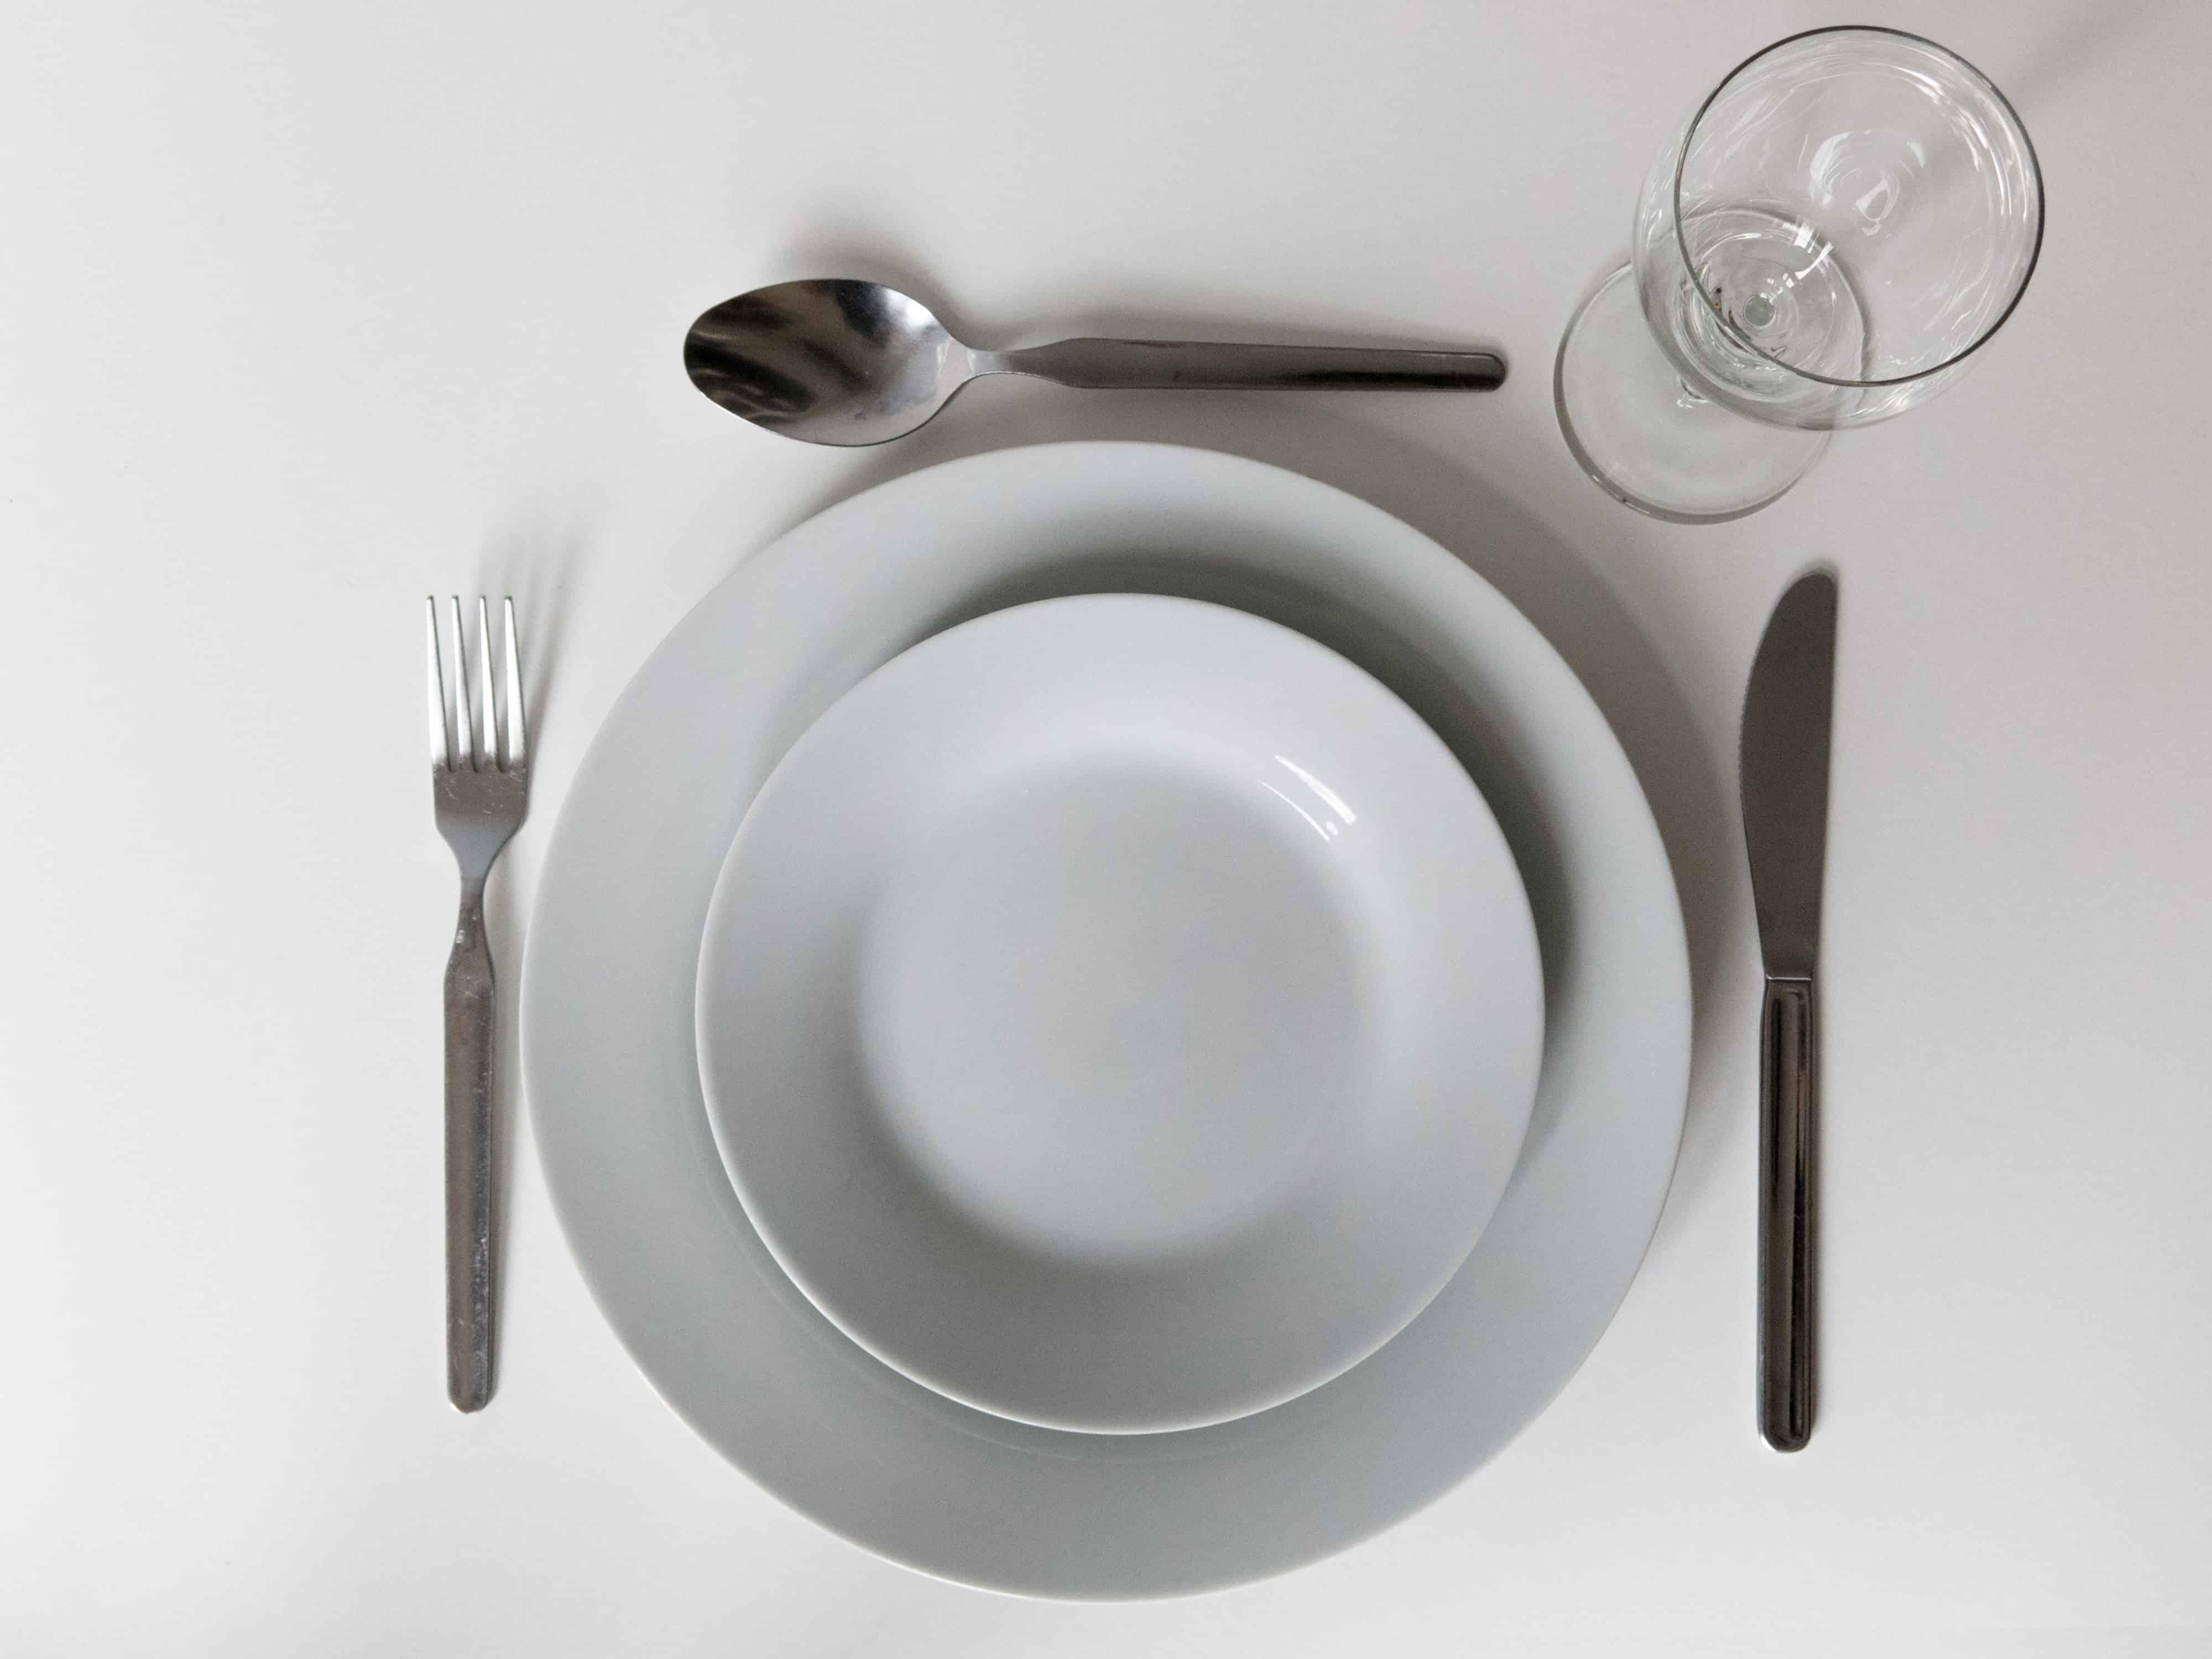 Restaurant review - gluten free, vegan friendly. The Gate Islington